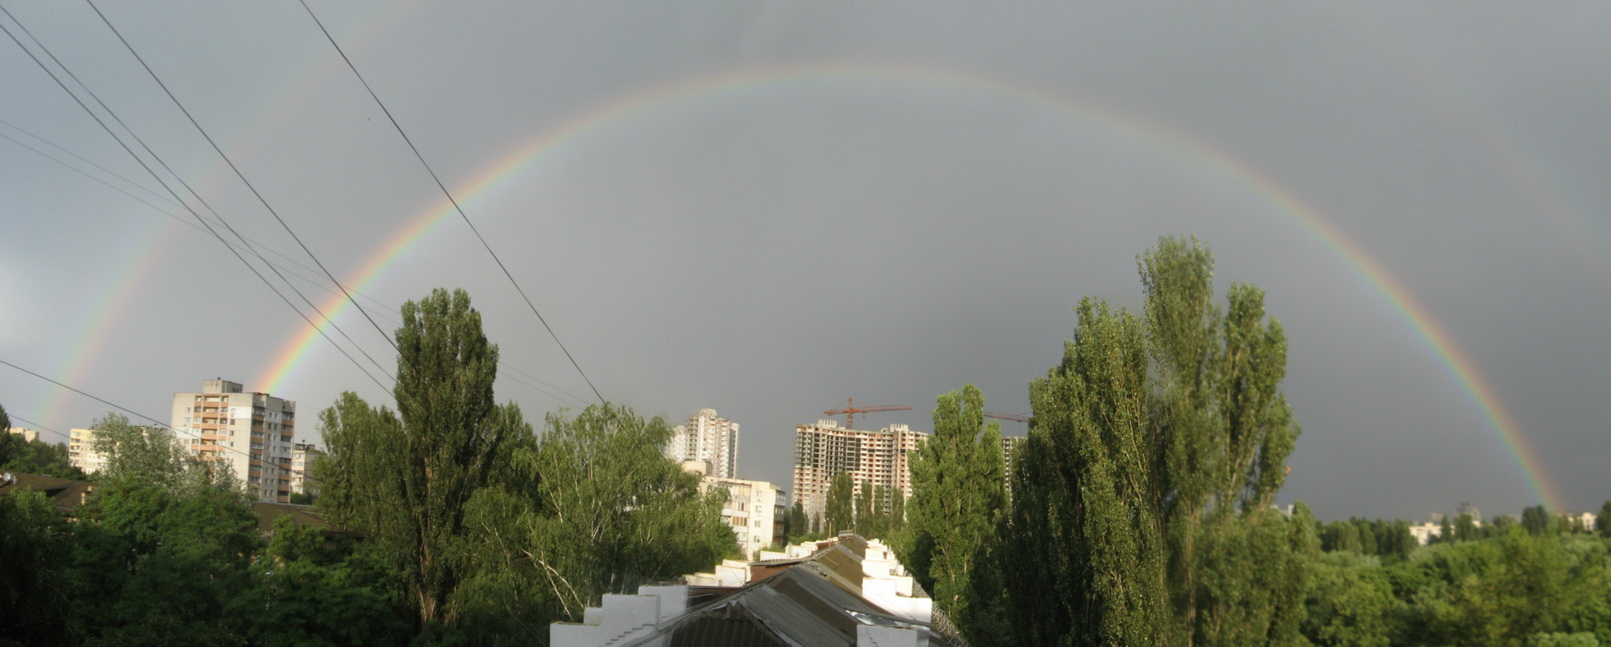 Rainbow_p_short_resize